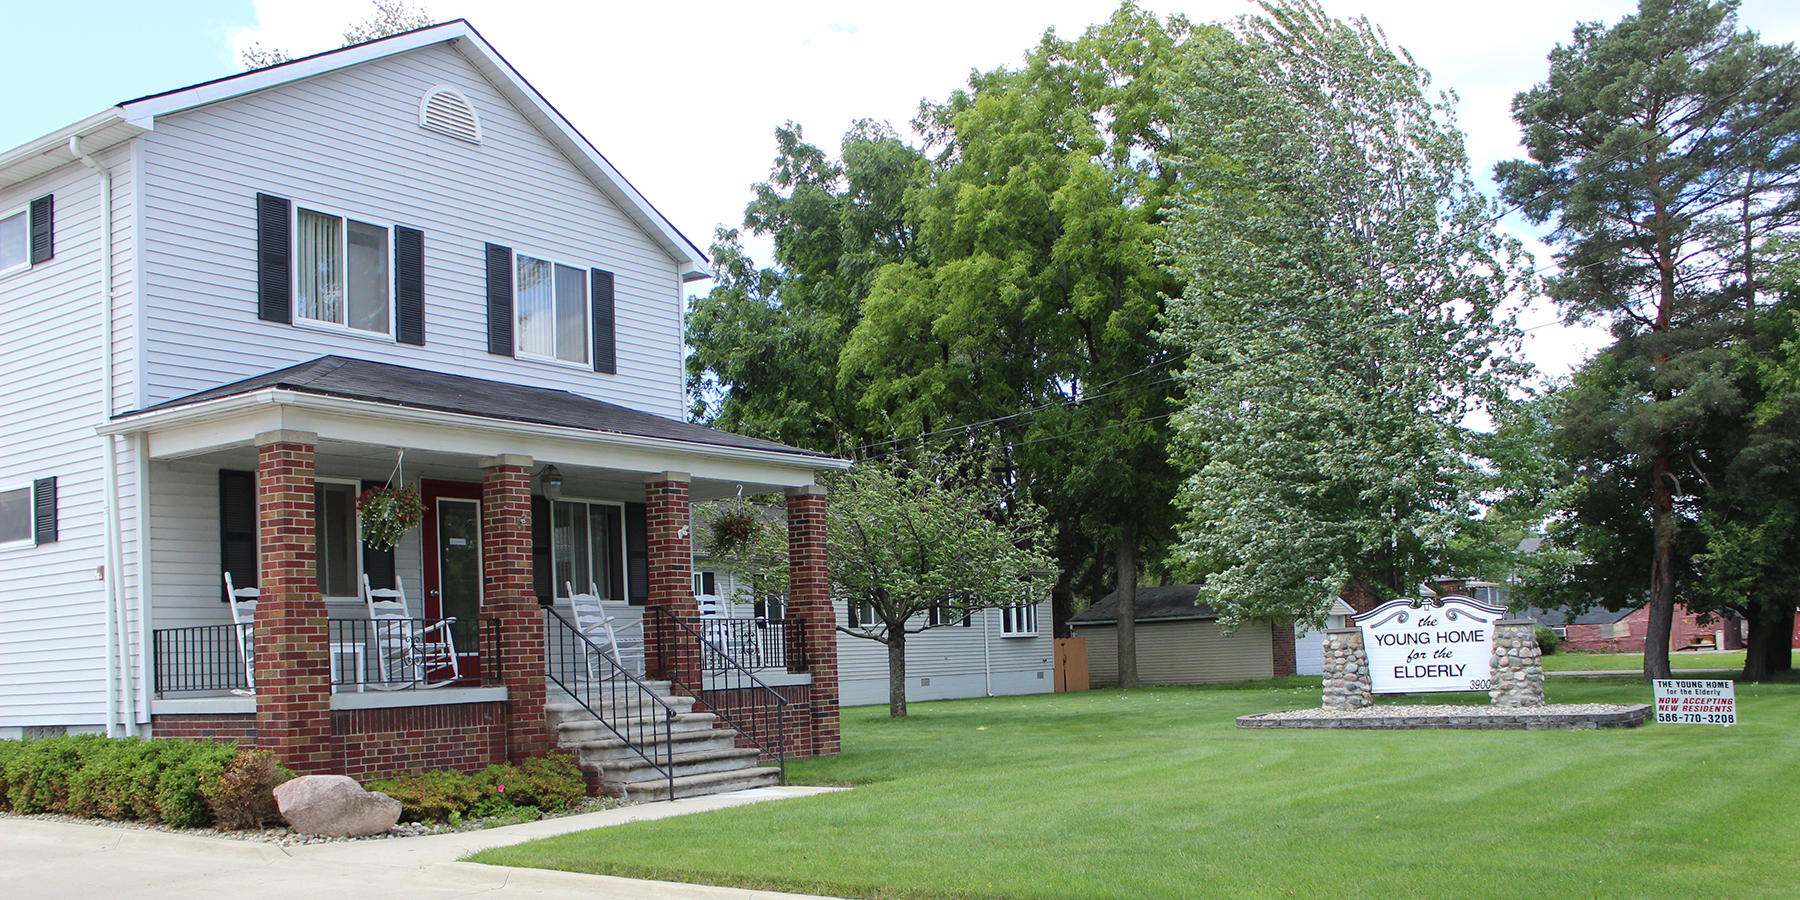 Young Home for the Elderly - Warren, MI